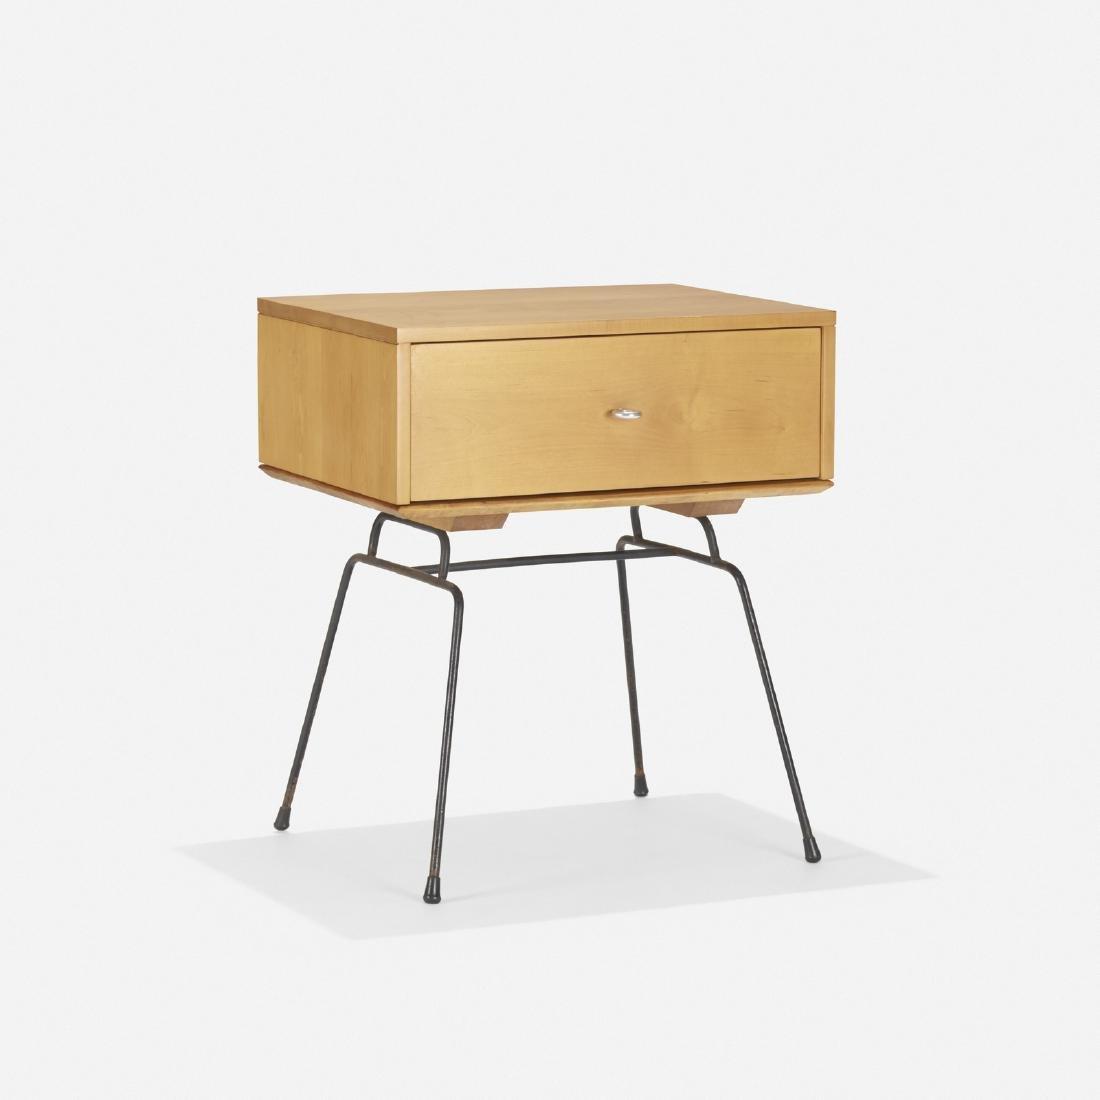 Paul McCobb, Planner Group nightstand, model 1500-15